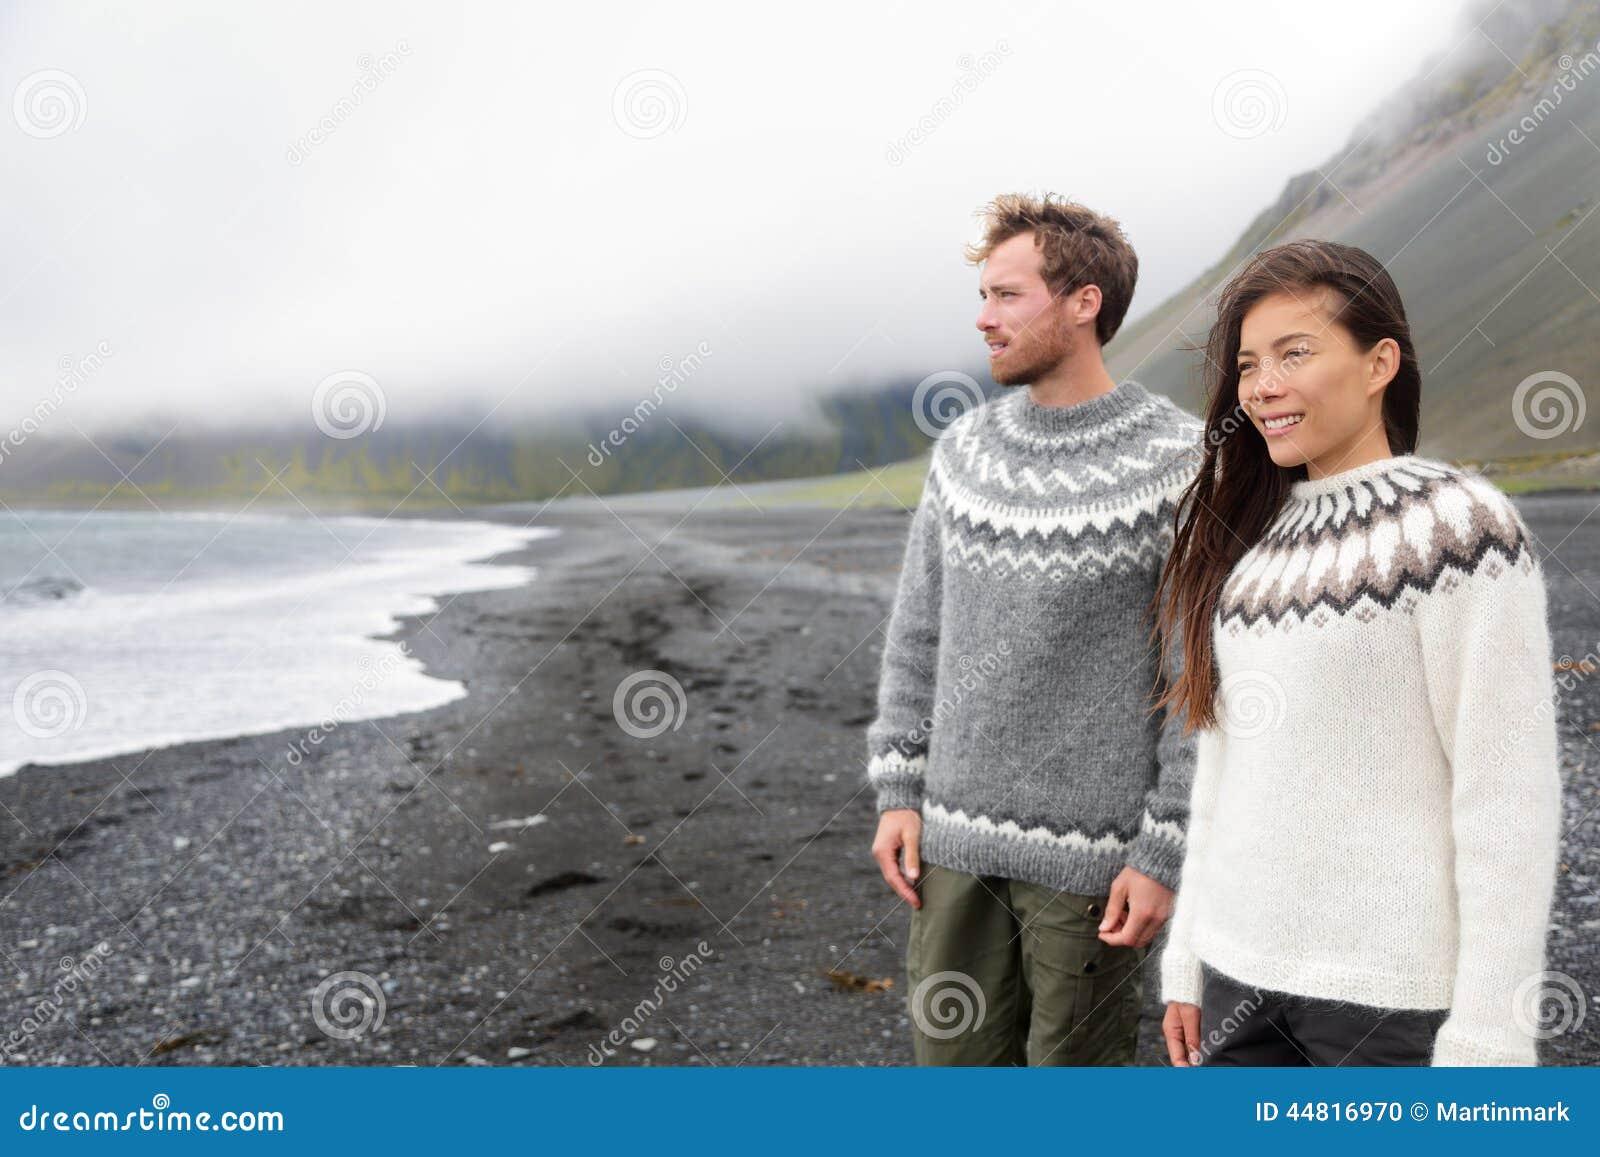 Iceland couple wearing Icelandic sweaters on beach